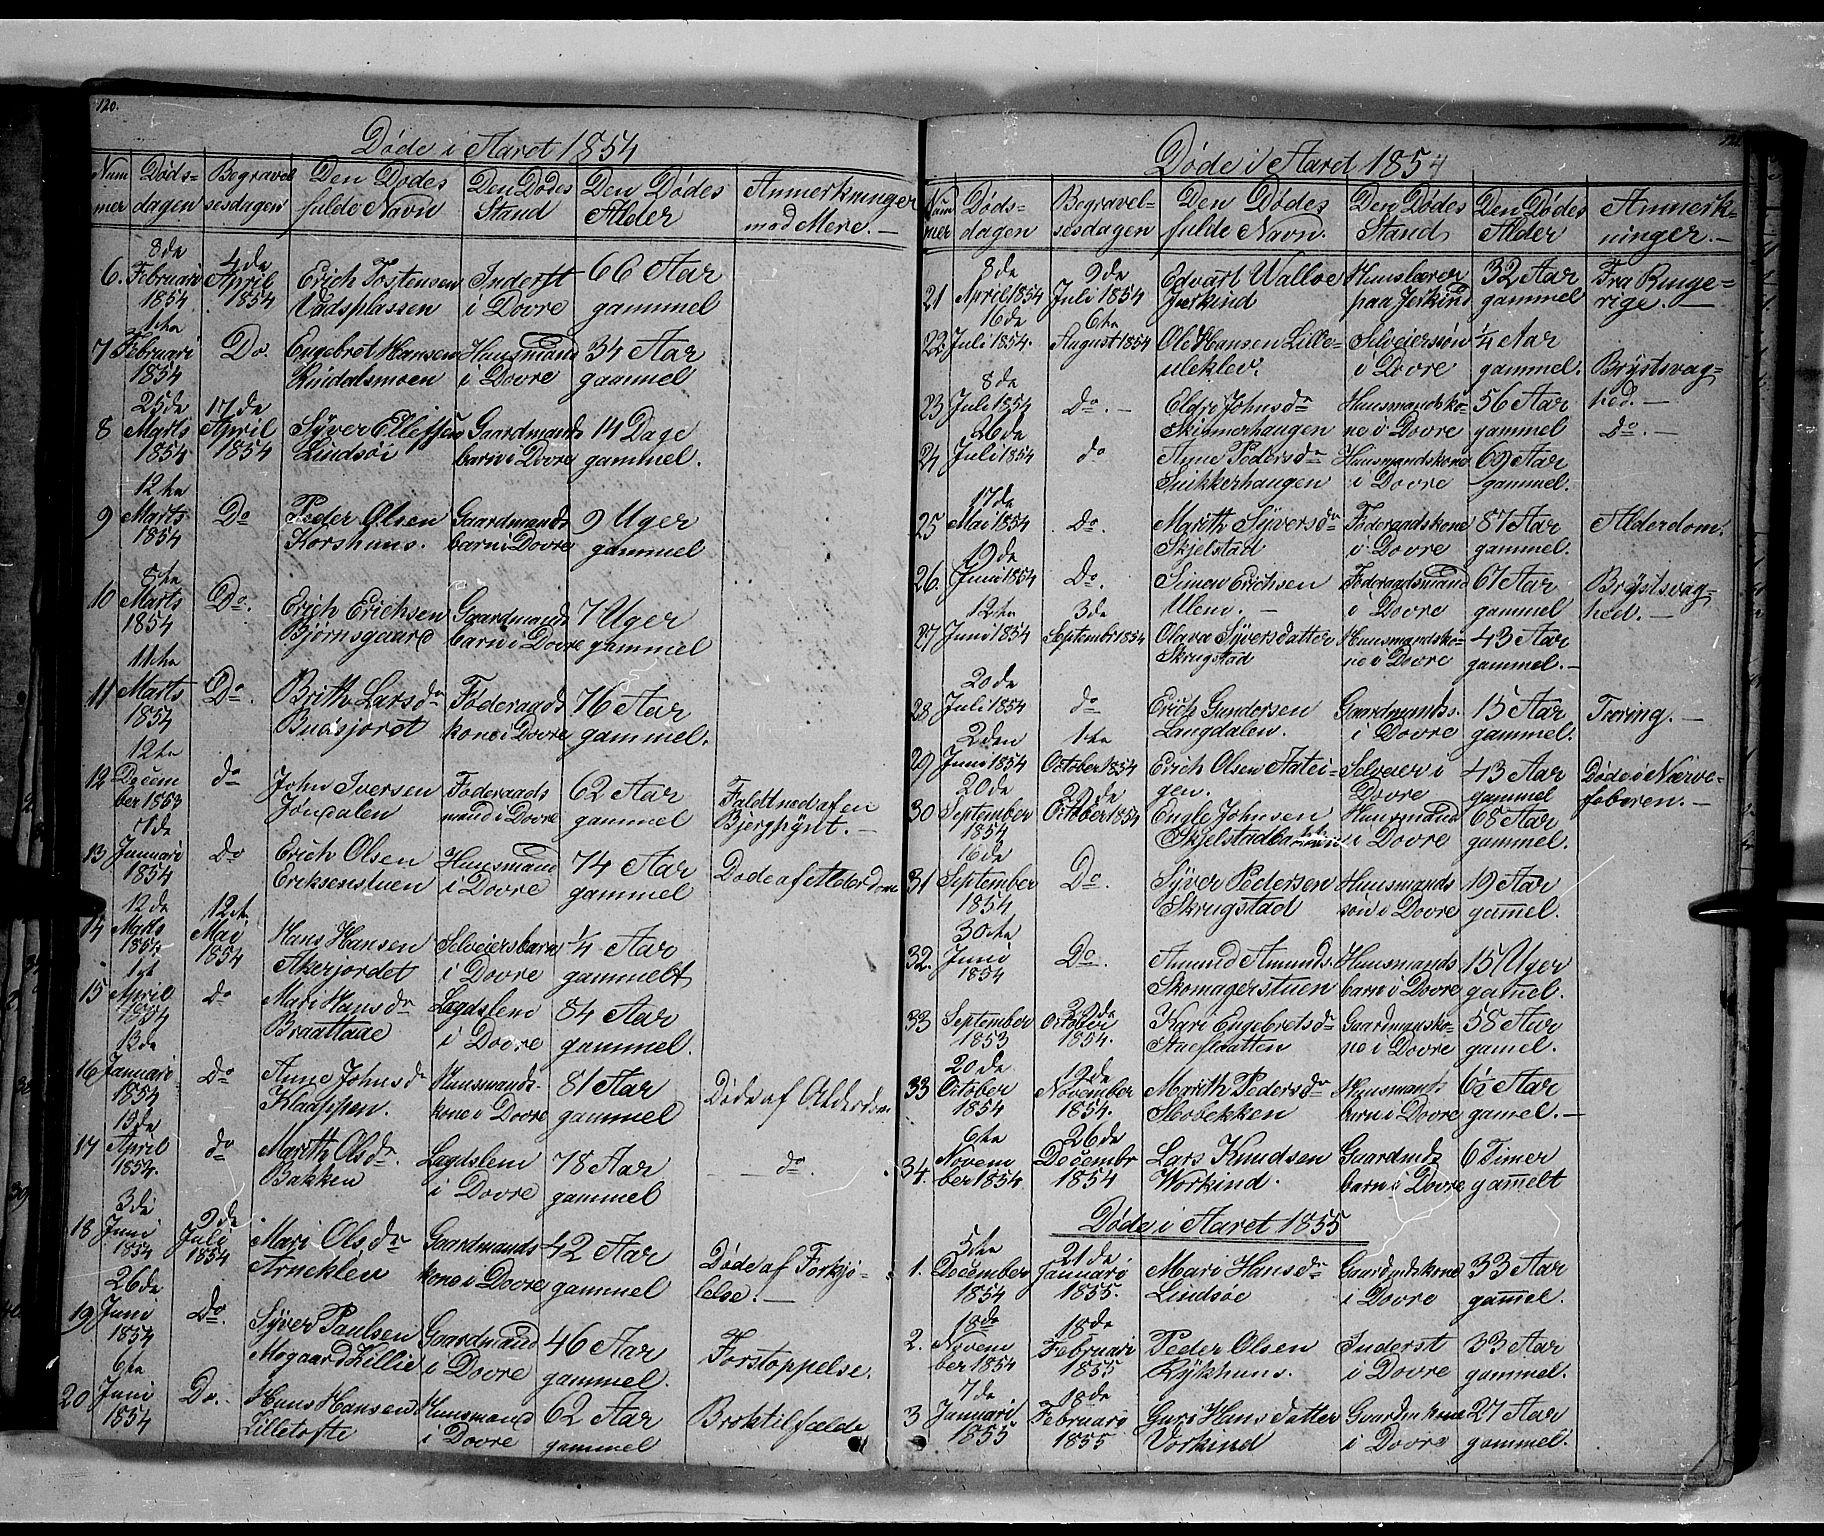 SAH, Lesja prestekontor, Klokkerbok nr. 3, 1842-1862, s. 120-121